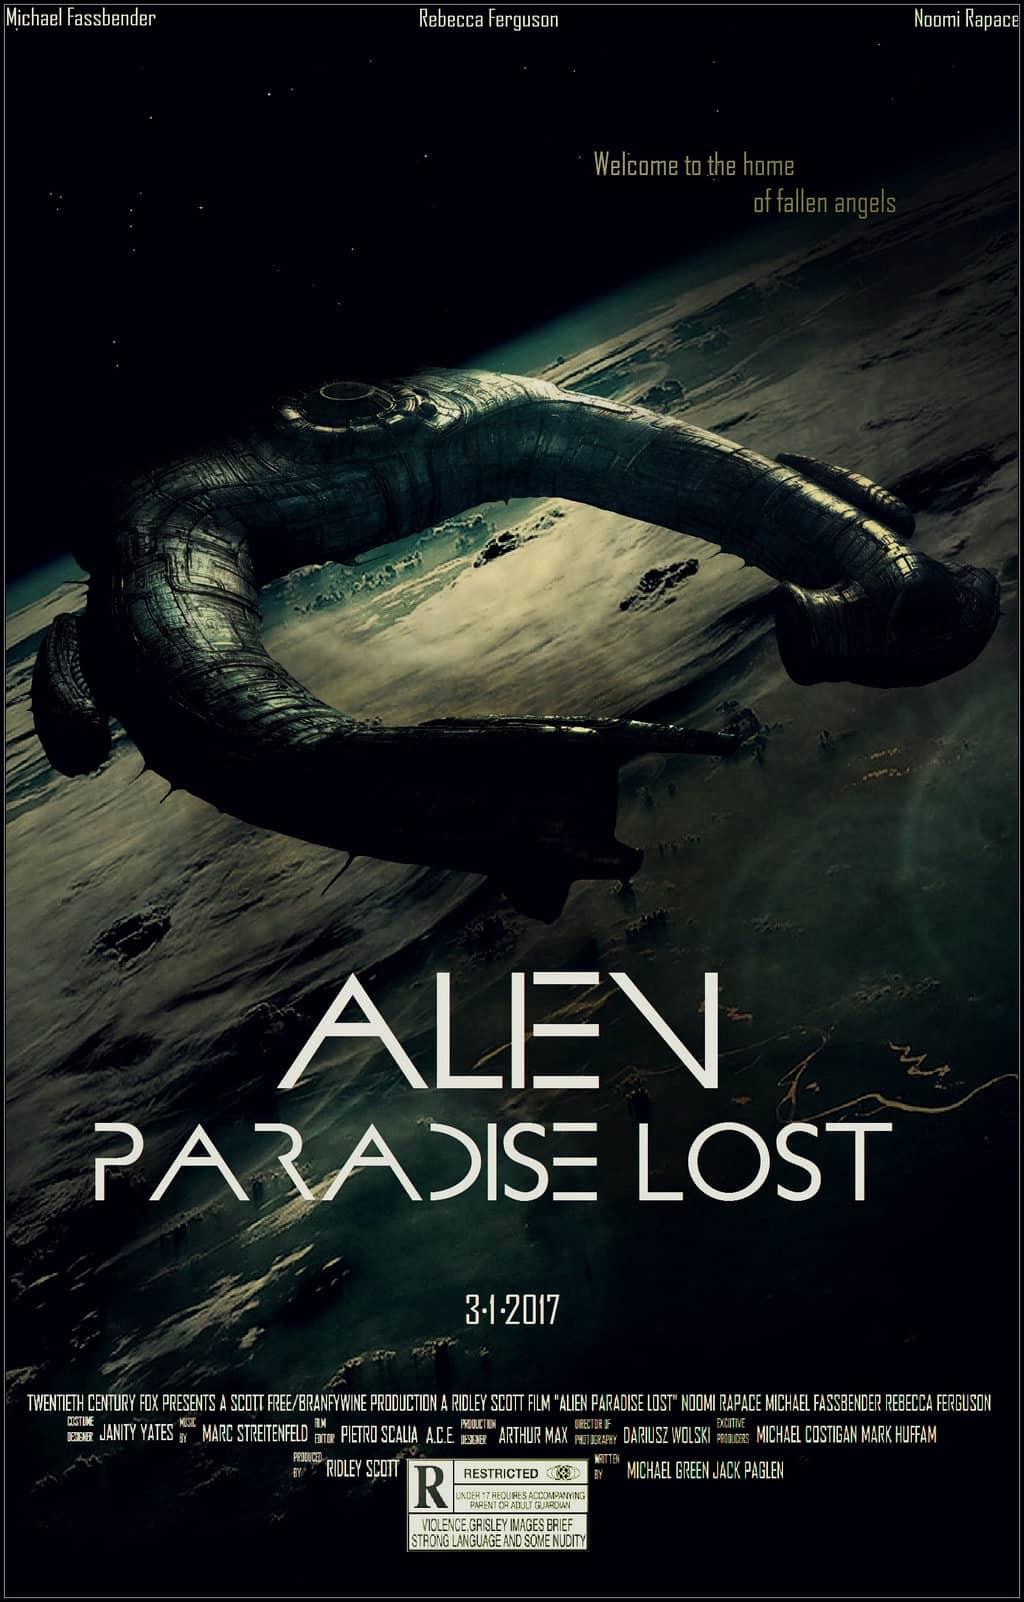 Alien: Paradise Lost